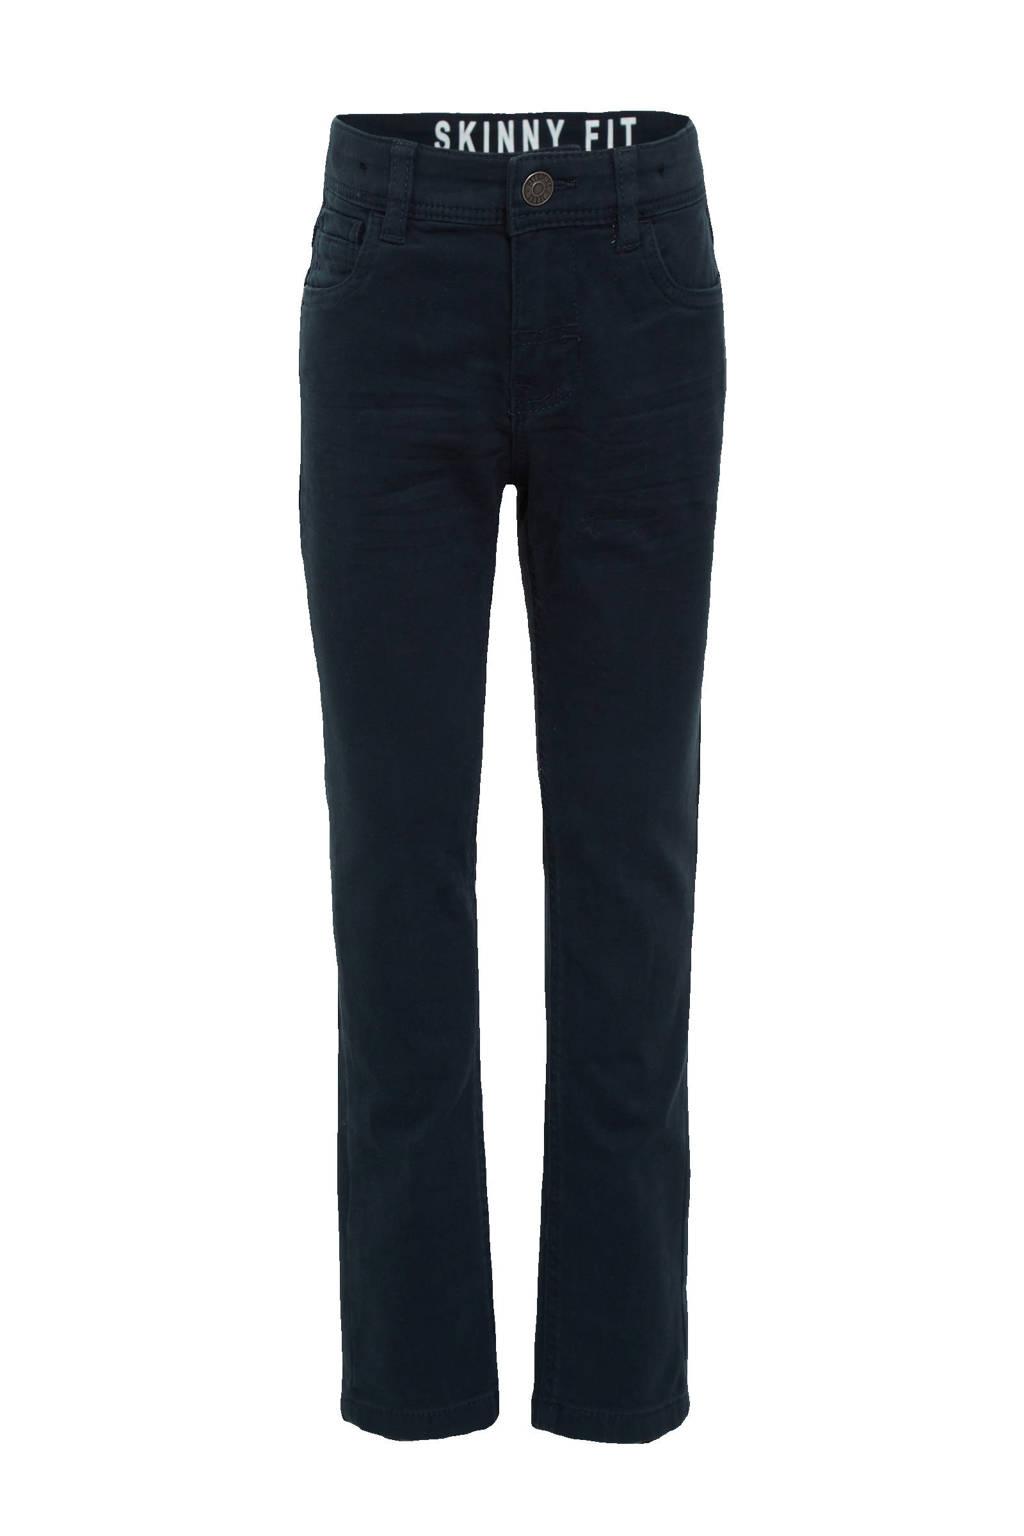 C&A Palomino skinny jeans donkerblauw, Donkerblauw